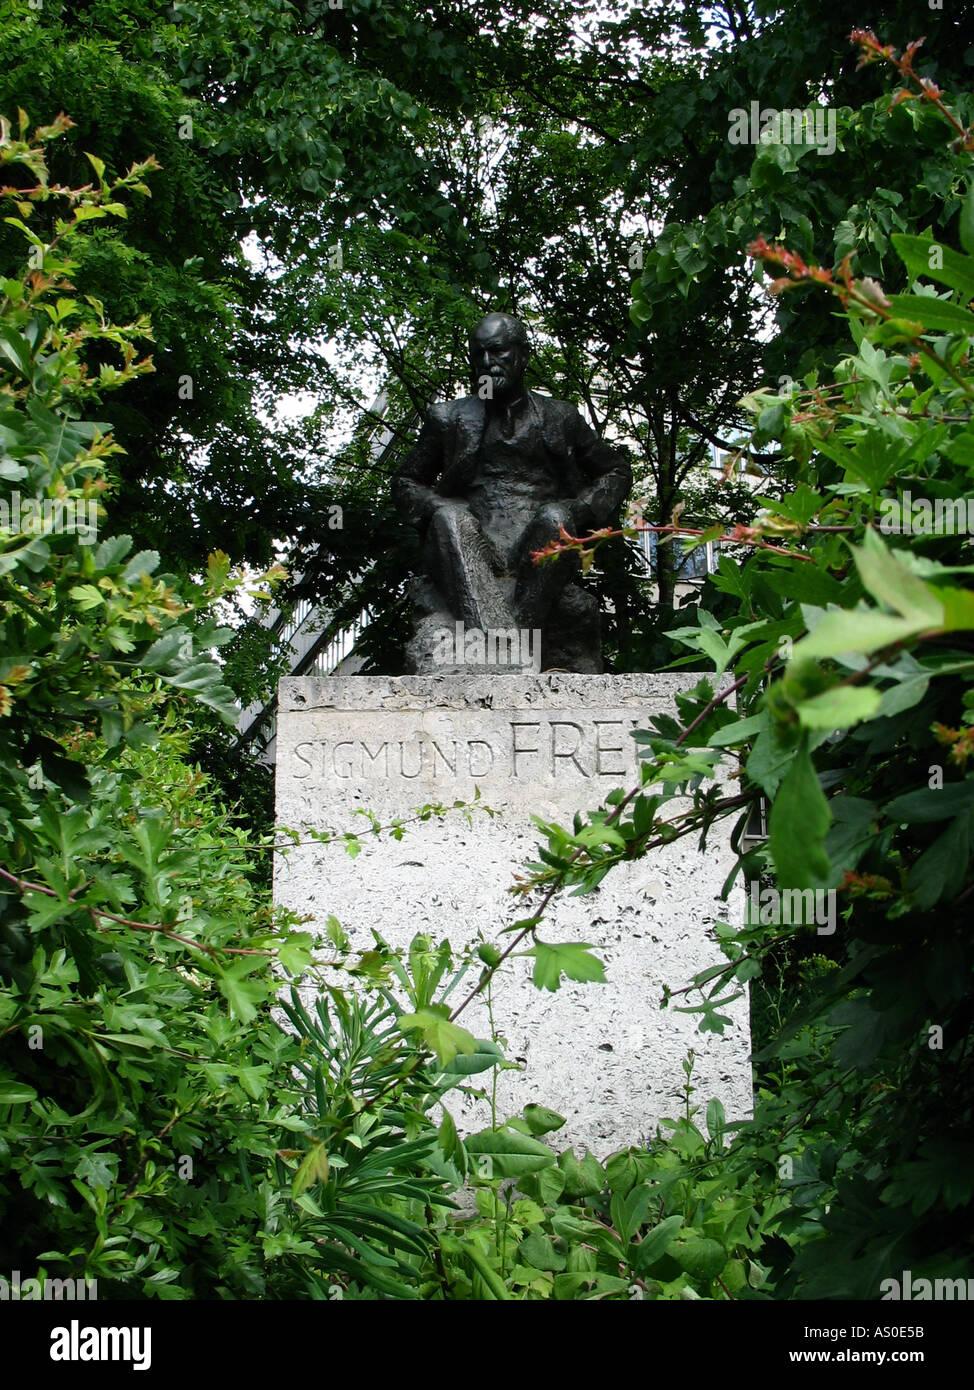 Sigmund Freud Statue - Stock Image